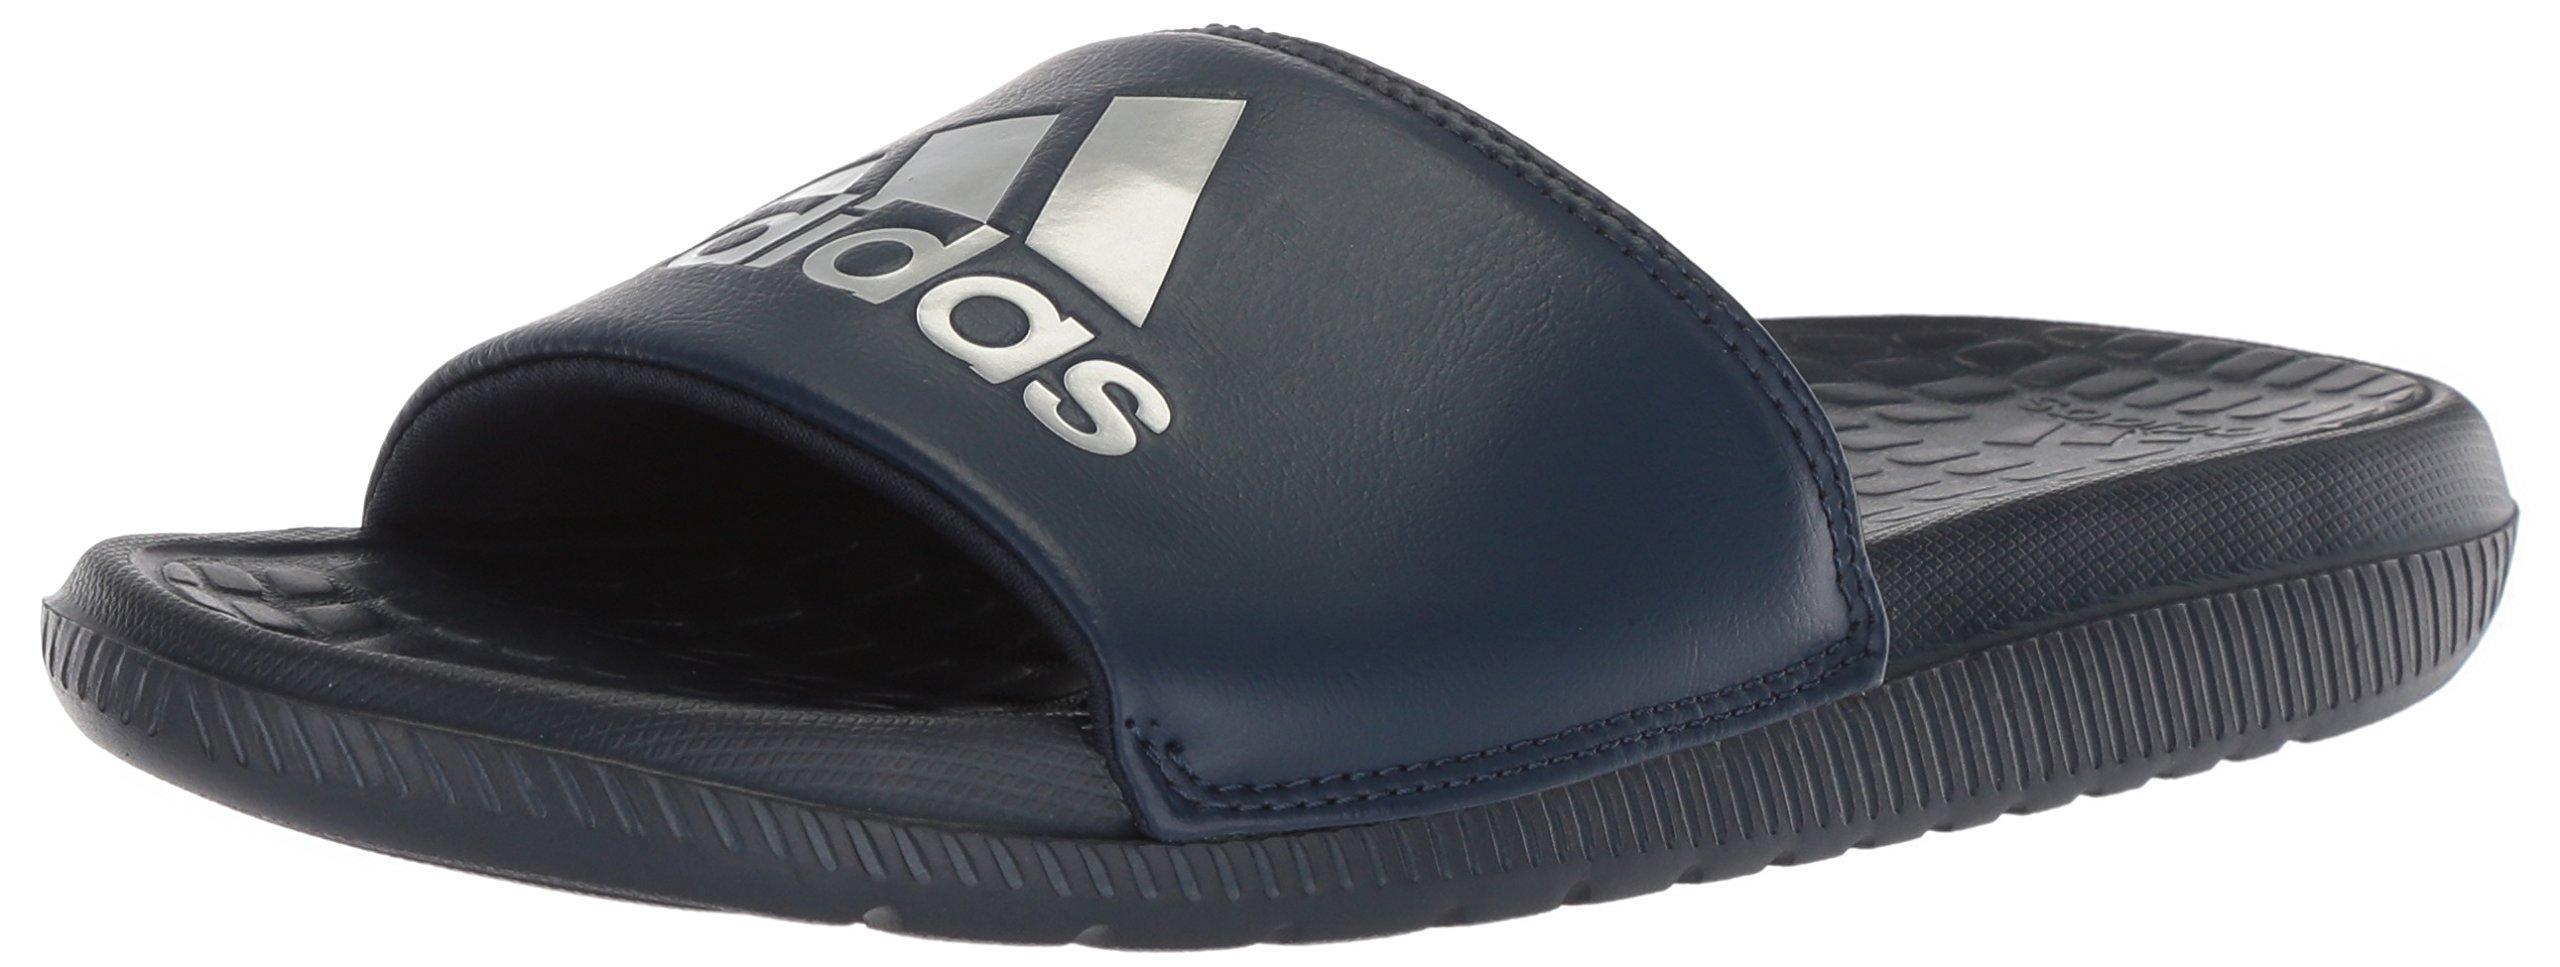 8a4d6a8d8900fc Get Quotations · adidas Men s Voloomix Slide Sandal